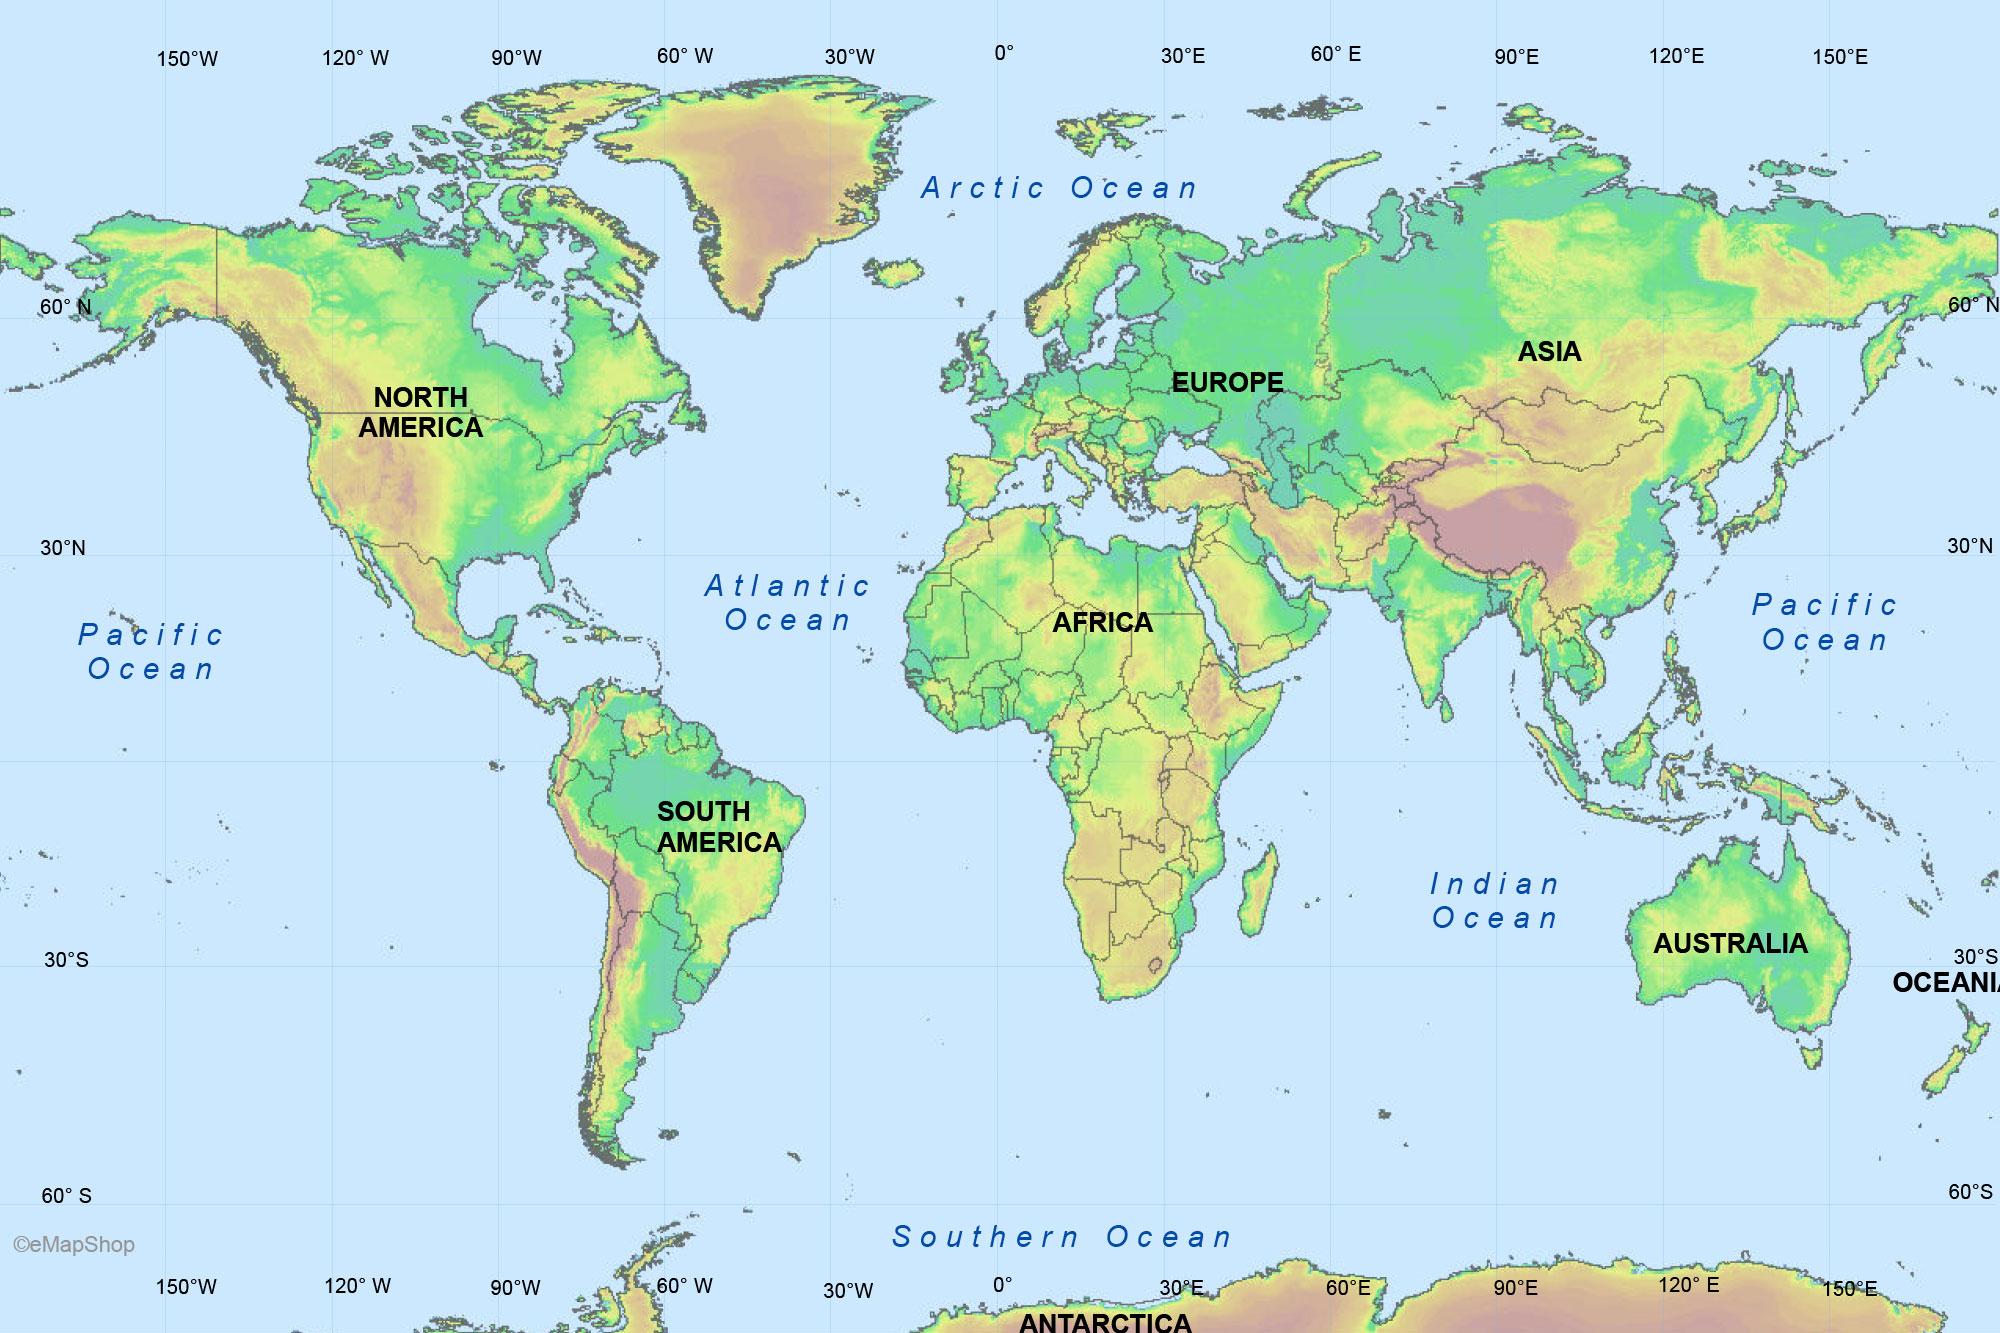 Digital Elementary School Maps Emapshop